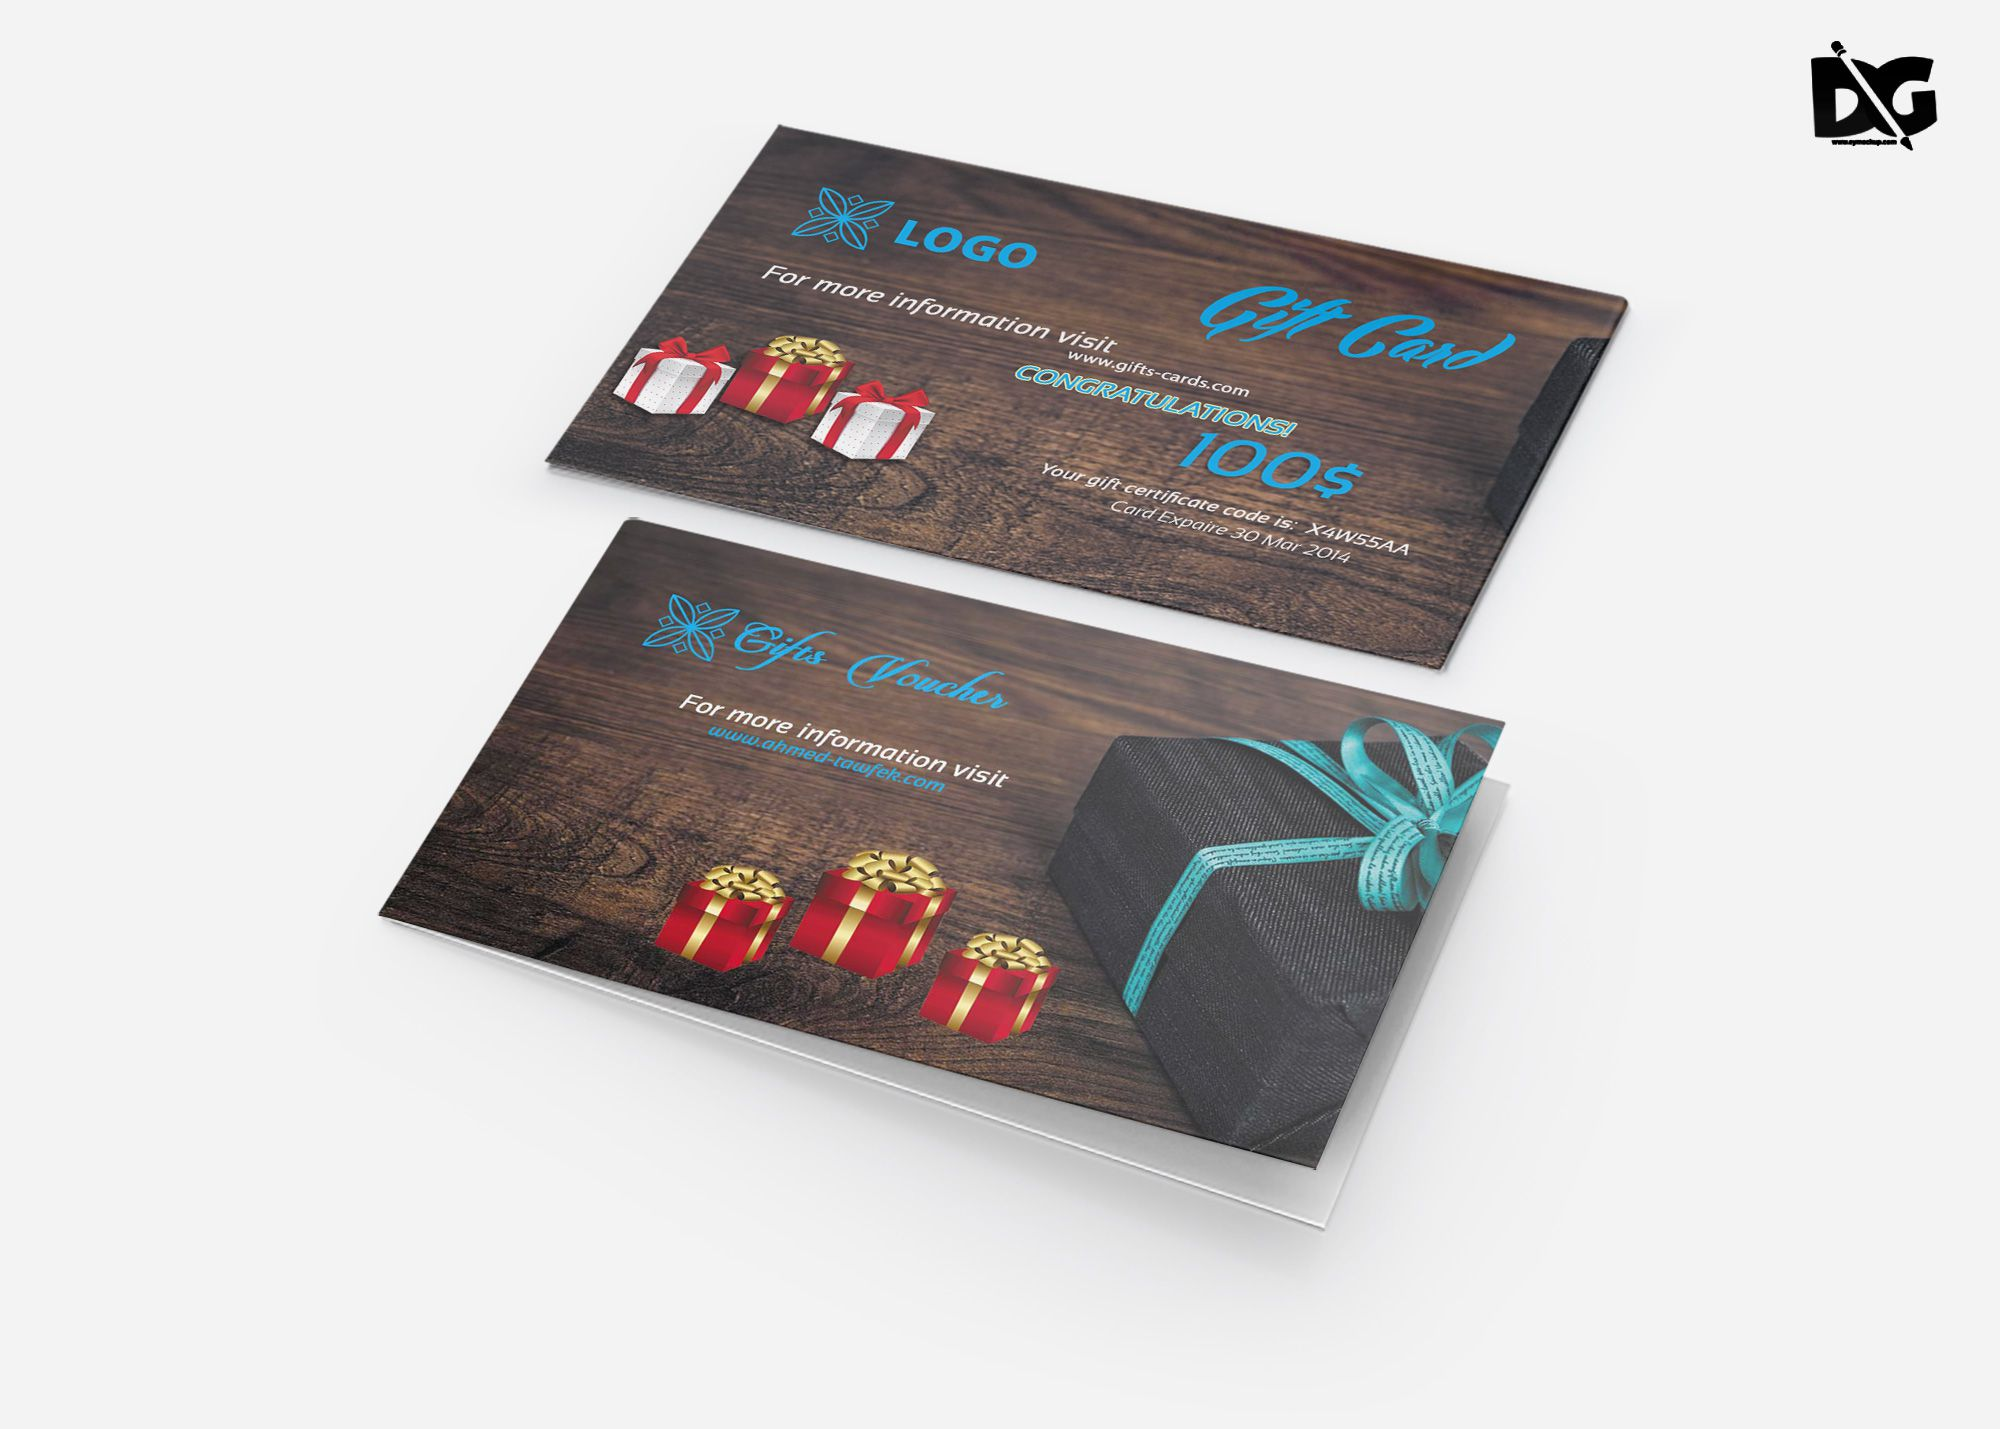 006 Incredible Gift Card Template Psd Idea  Christma Photoshop Free HolderFull